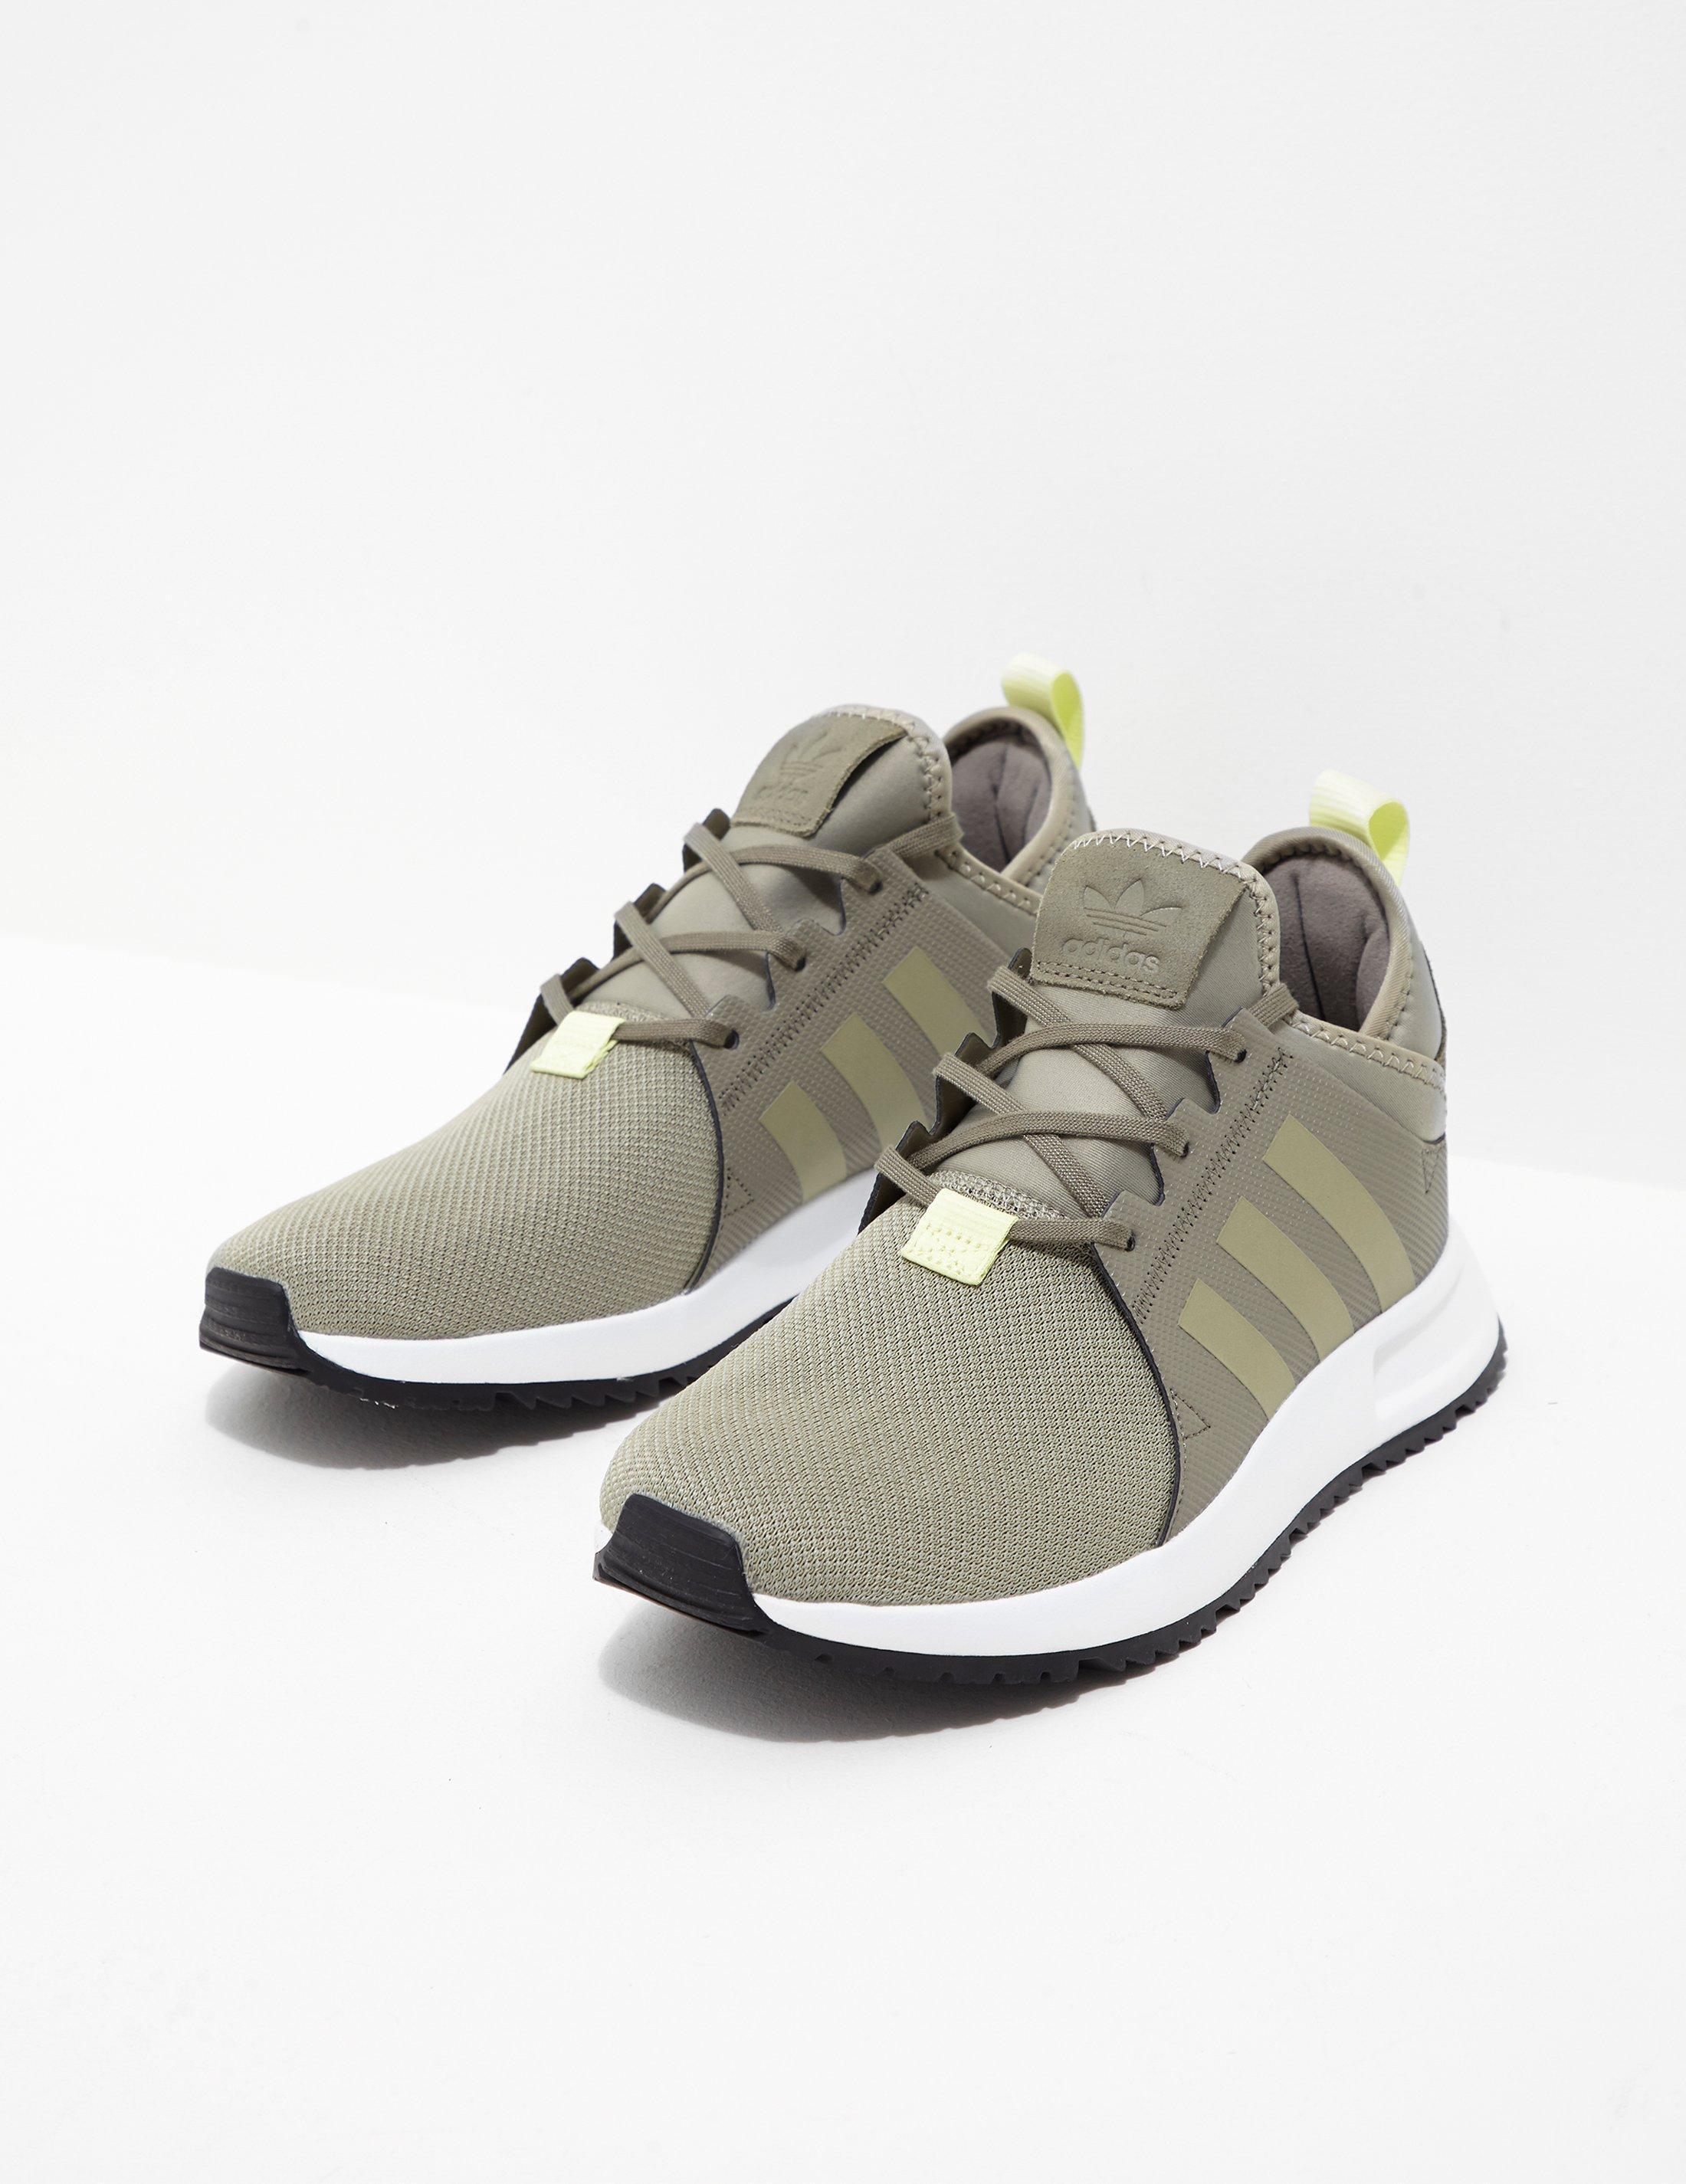 adidas Originals Mens Xplr Sneakerboot Cargogreen in Green